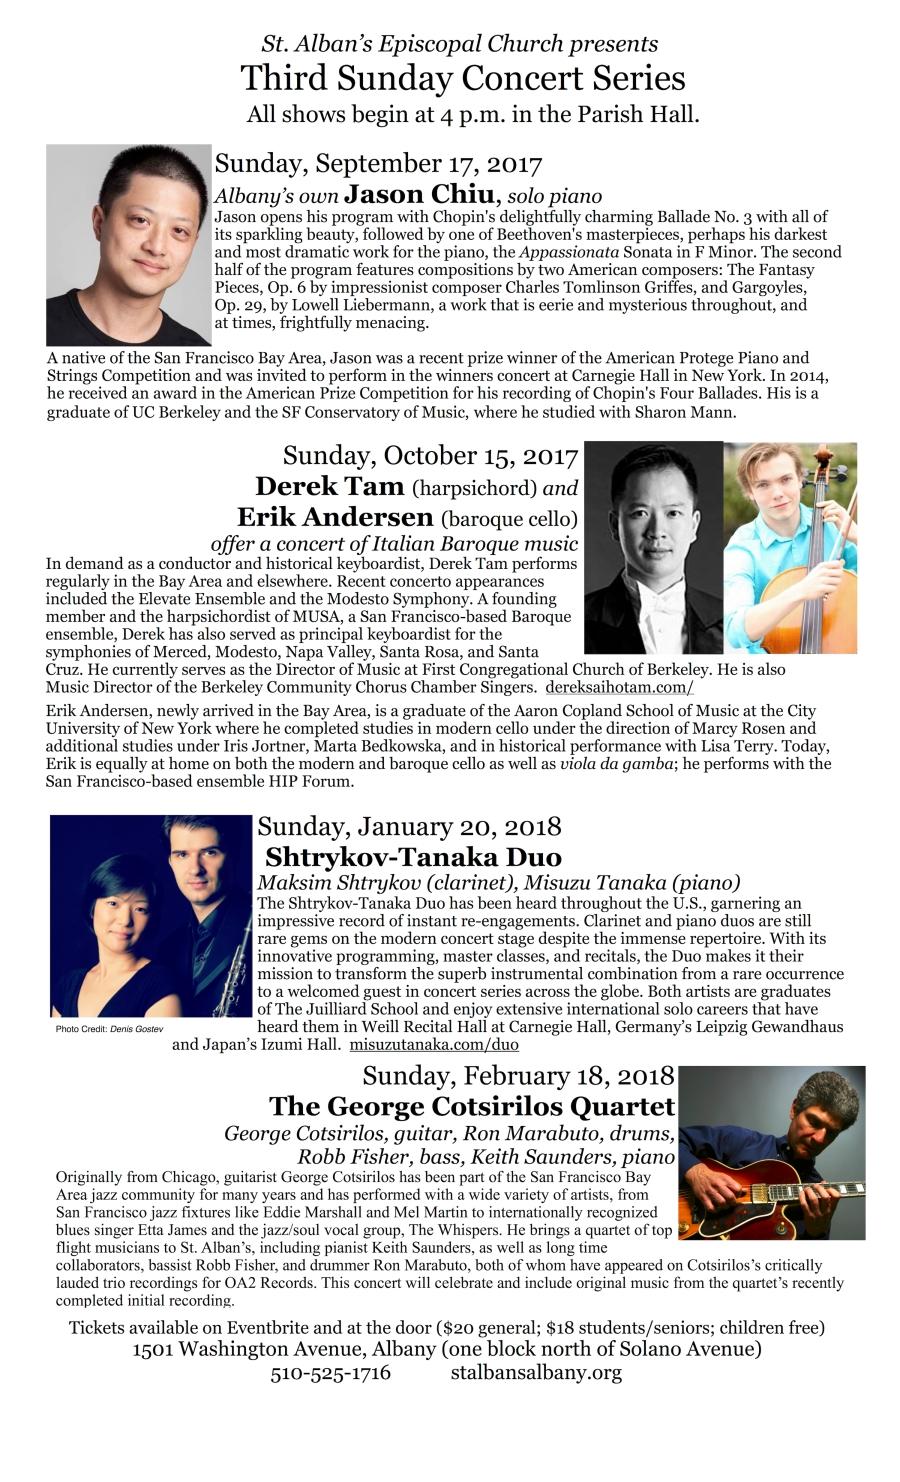 Third Sunday Concert Series Sept 2017 Jan 2018